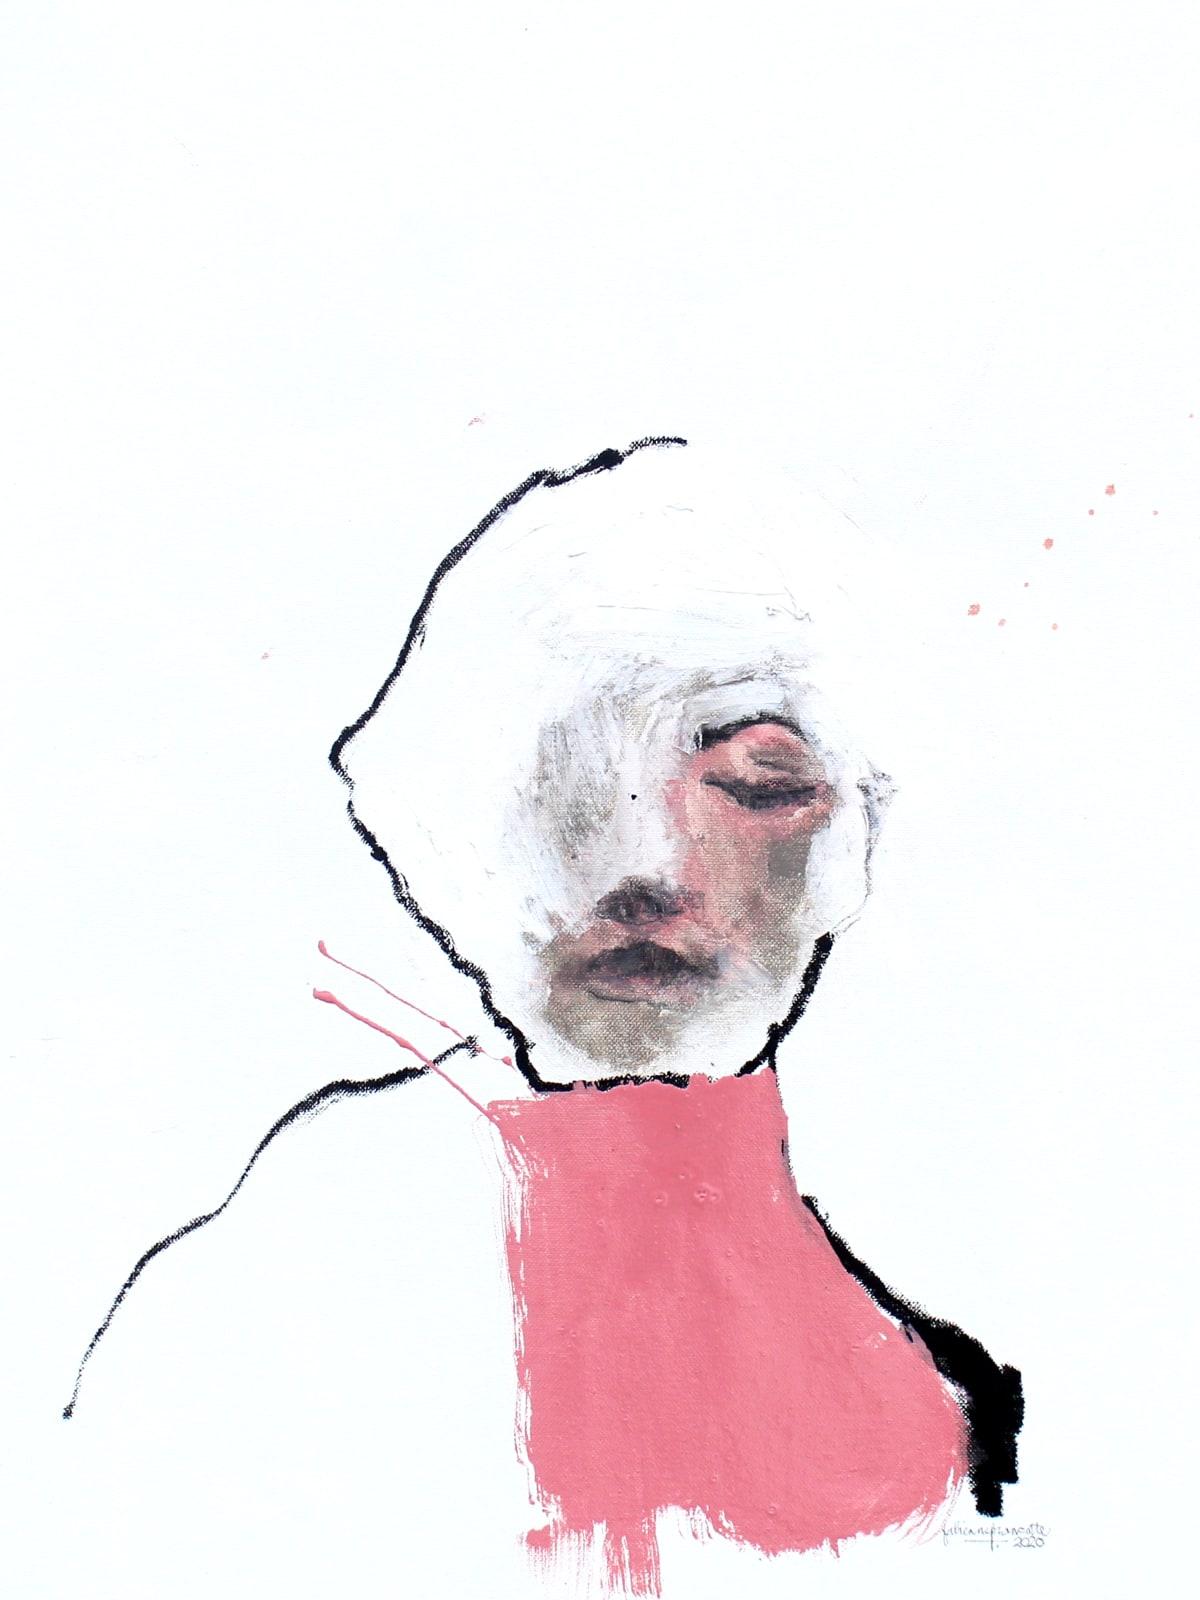 Fabienne Francotte, Limited Edition Print, 2021, 24